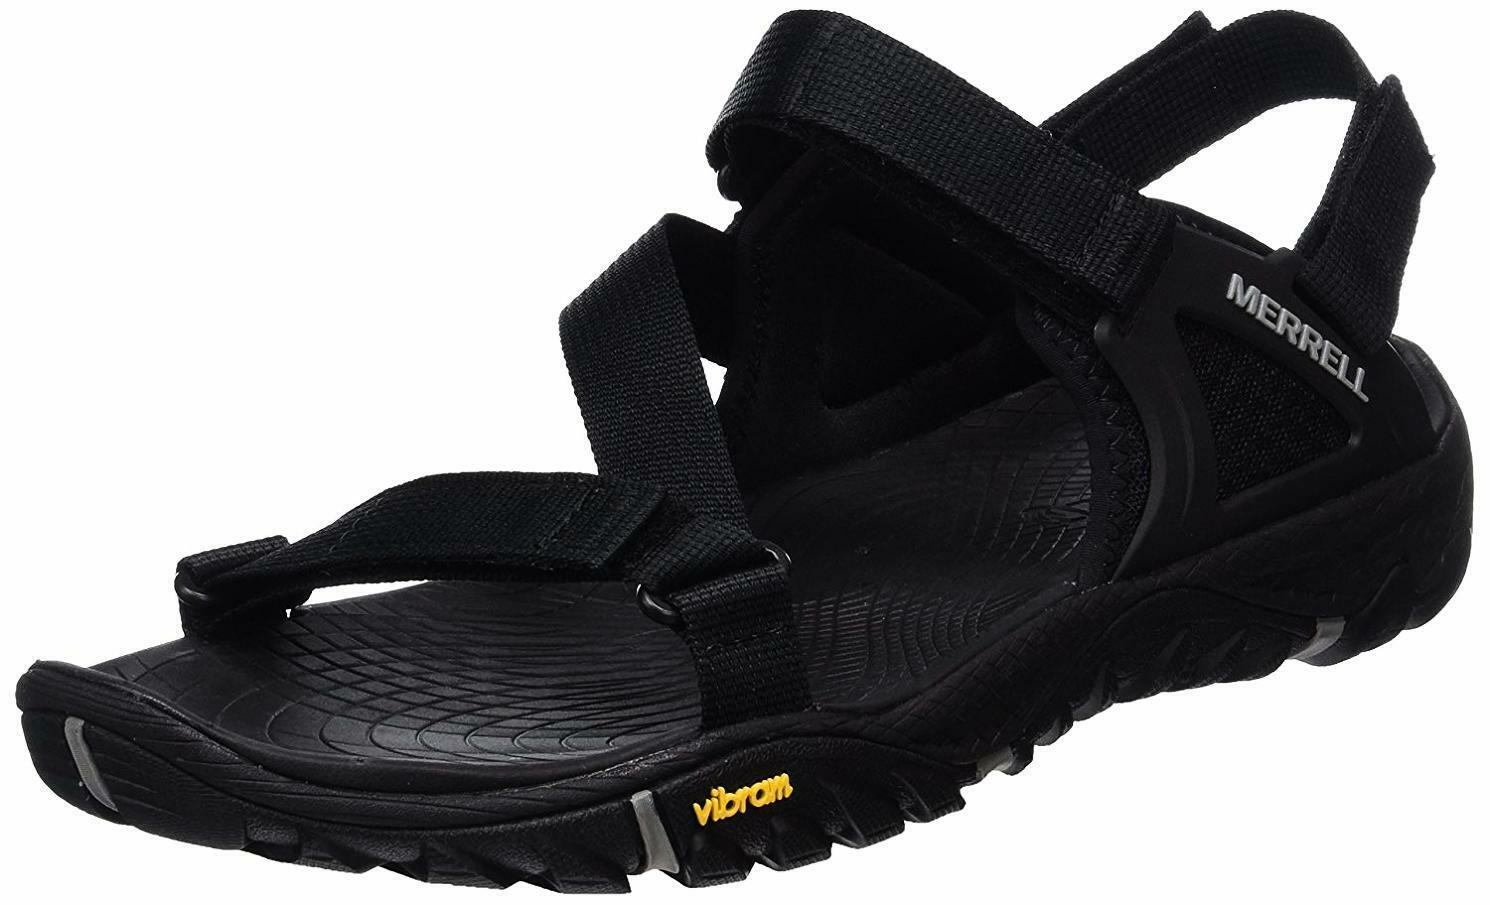 Homme Merrell All Out Randonnée Blaze Web chaussures-Choisir Taille couleur